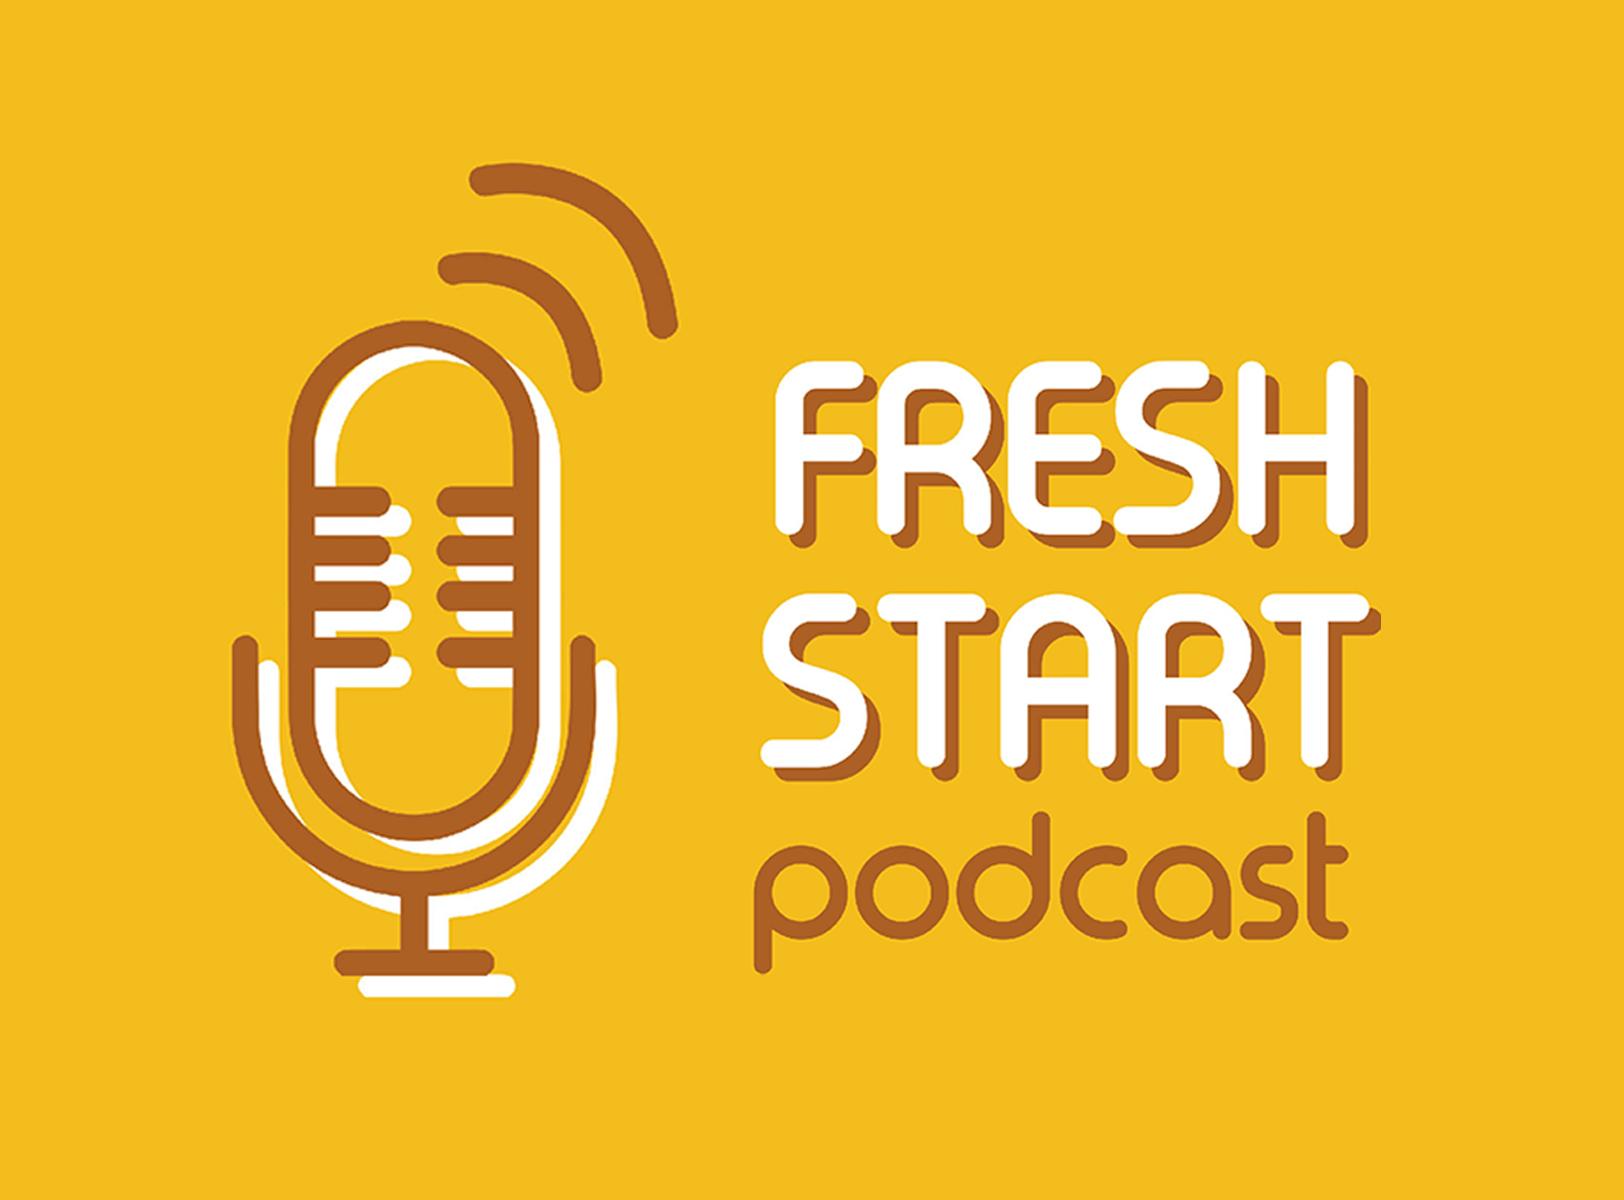 Fresh Start: Podcast News (8/2/2019 Fri.)